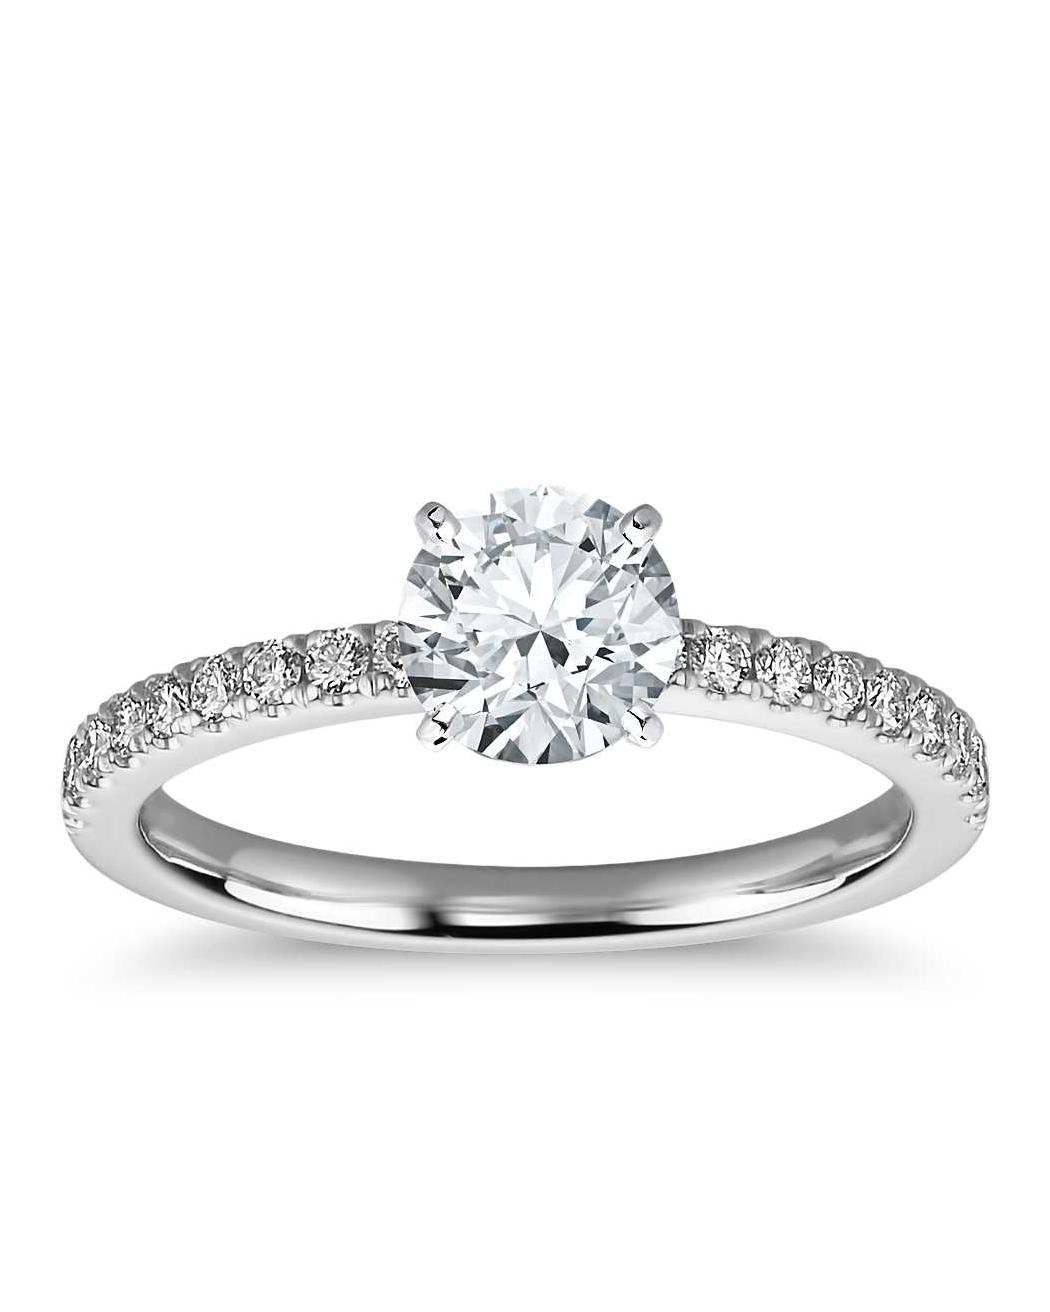 Blue Nile Petite Pave Diamond Engagement Ring